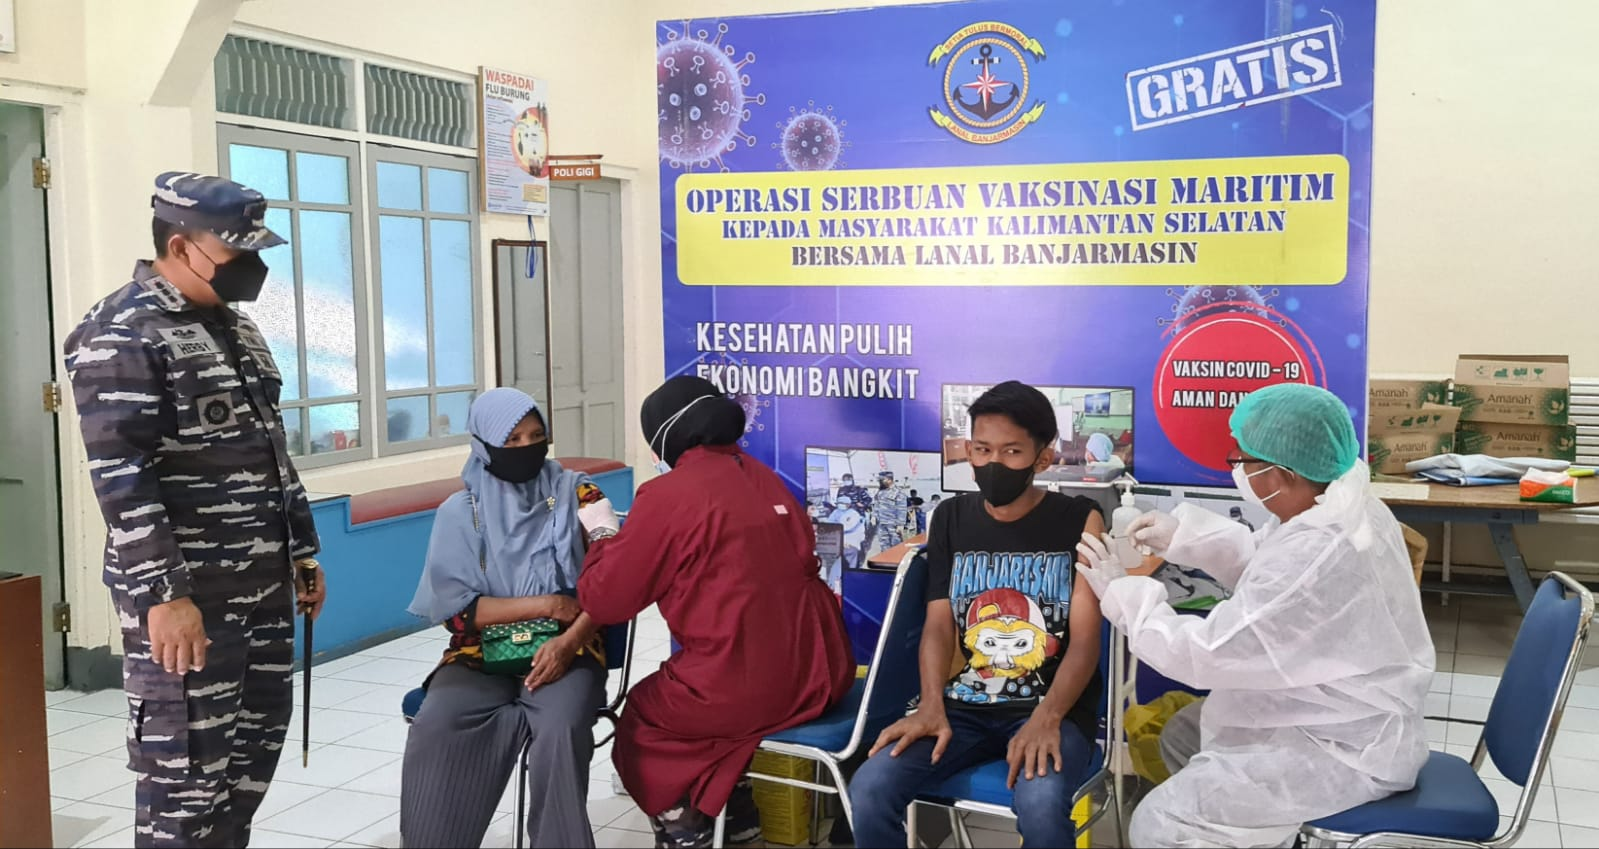 Nakes Lanal Banjarmasin gencarkan vaksinasi maritim kepada warga pesisir